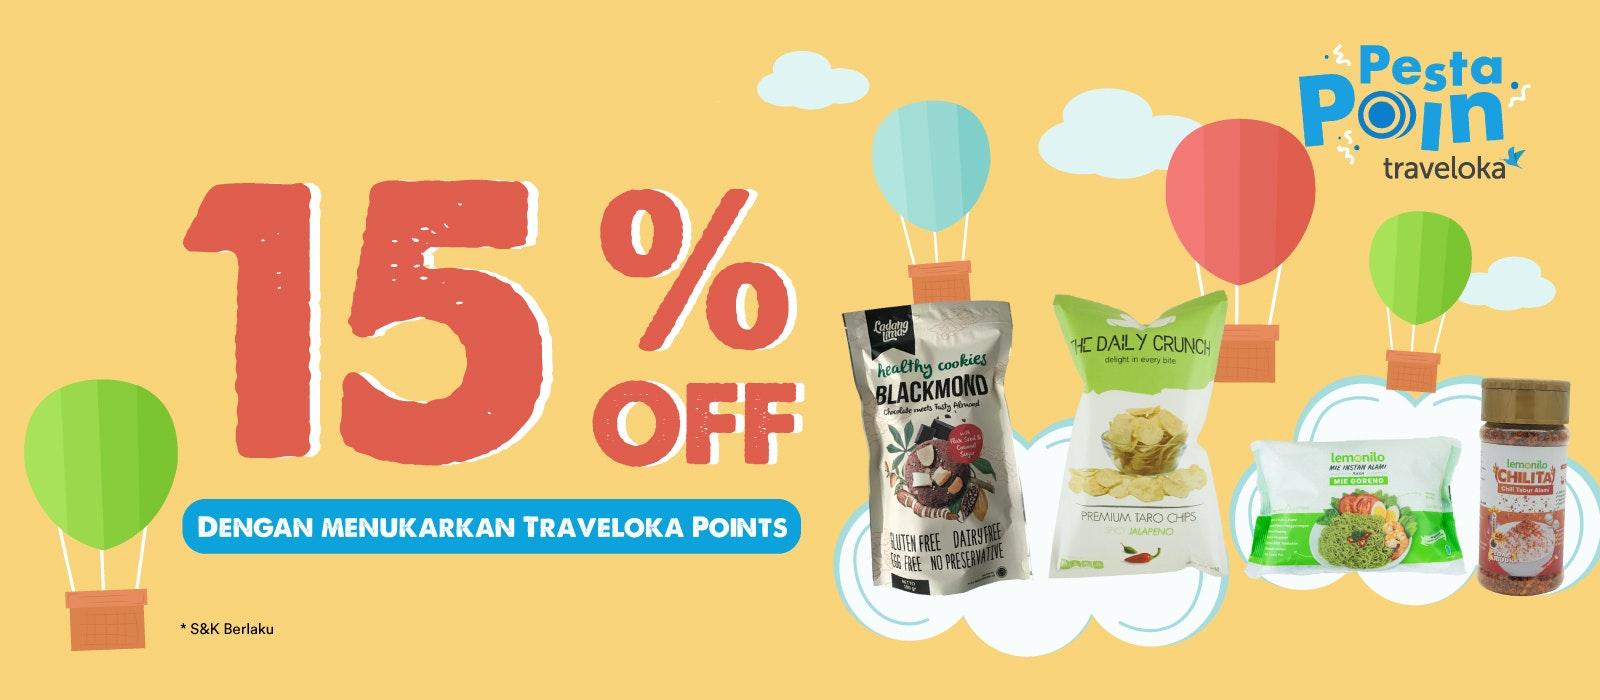 Pesta Poin Traveloka: 15% OFF dengan Menukarkan Traveloka Points